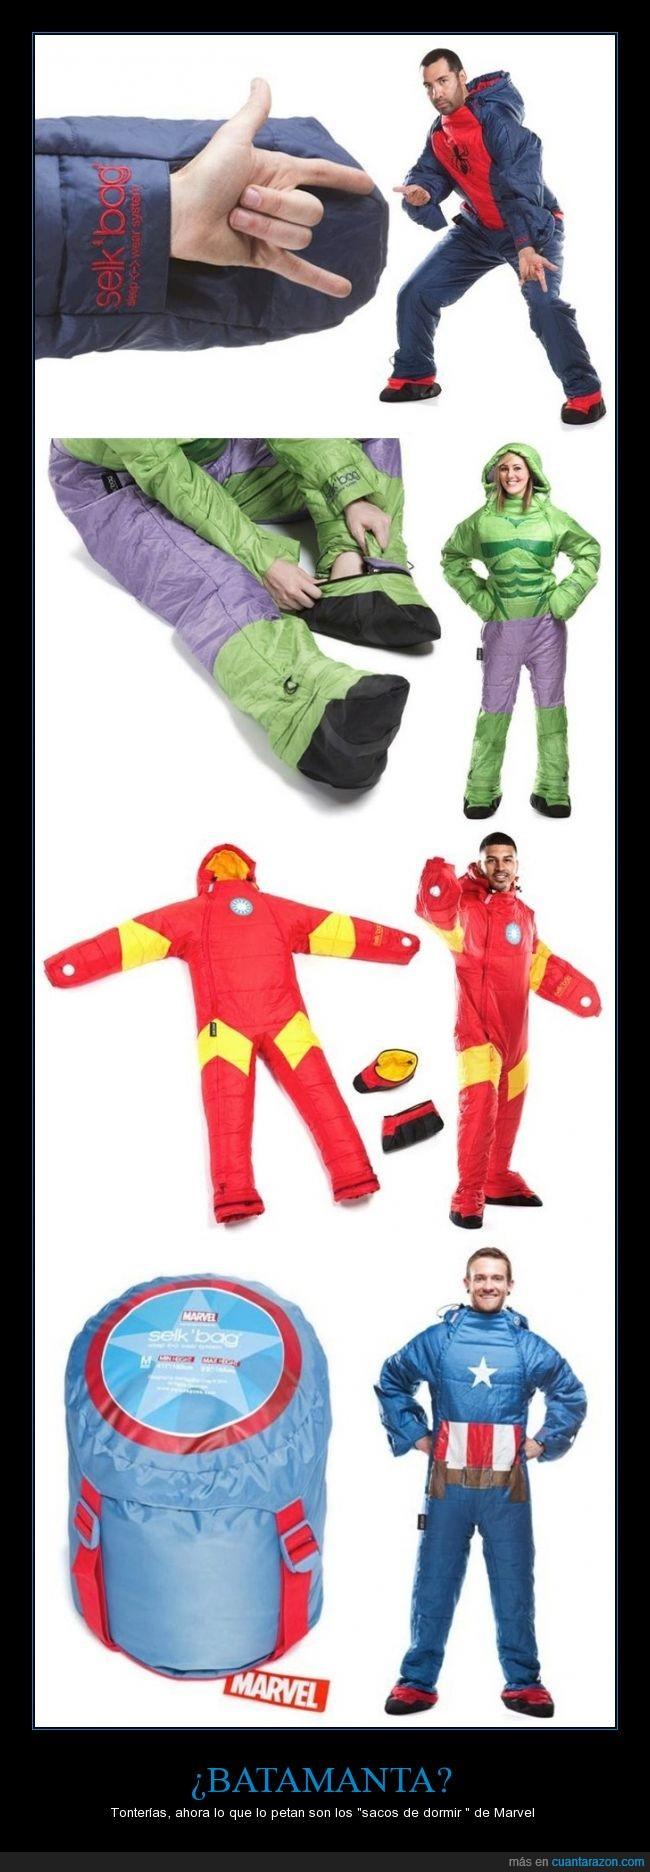 batamanta,capitan america,dormir,hulk,iron man,marvel,piernas,saco,spiderman